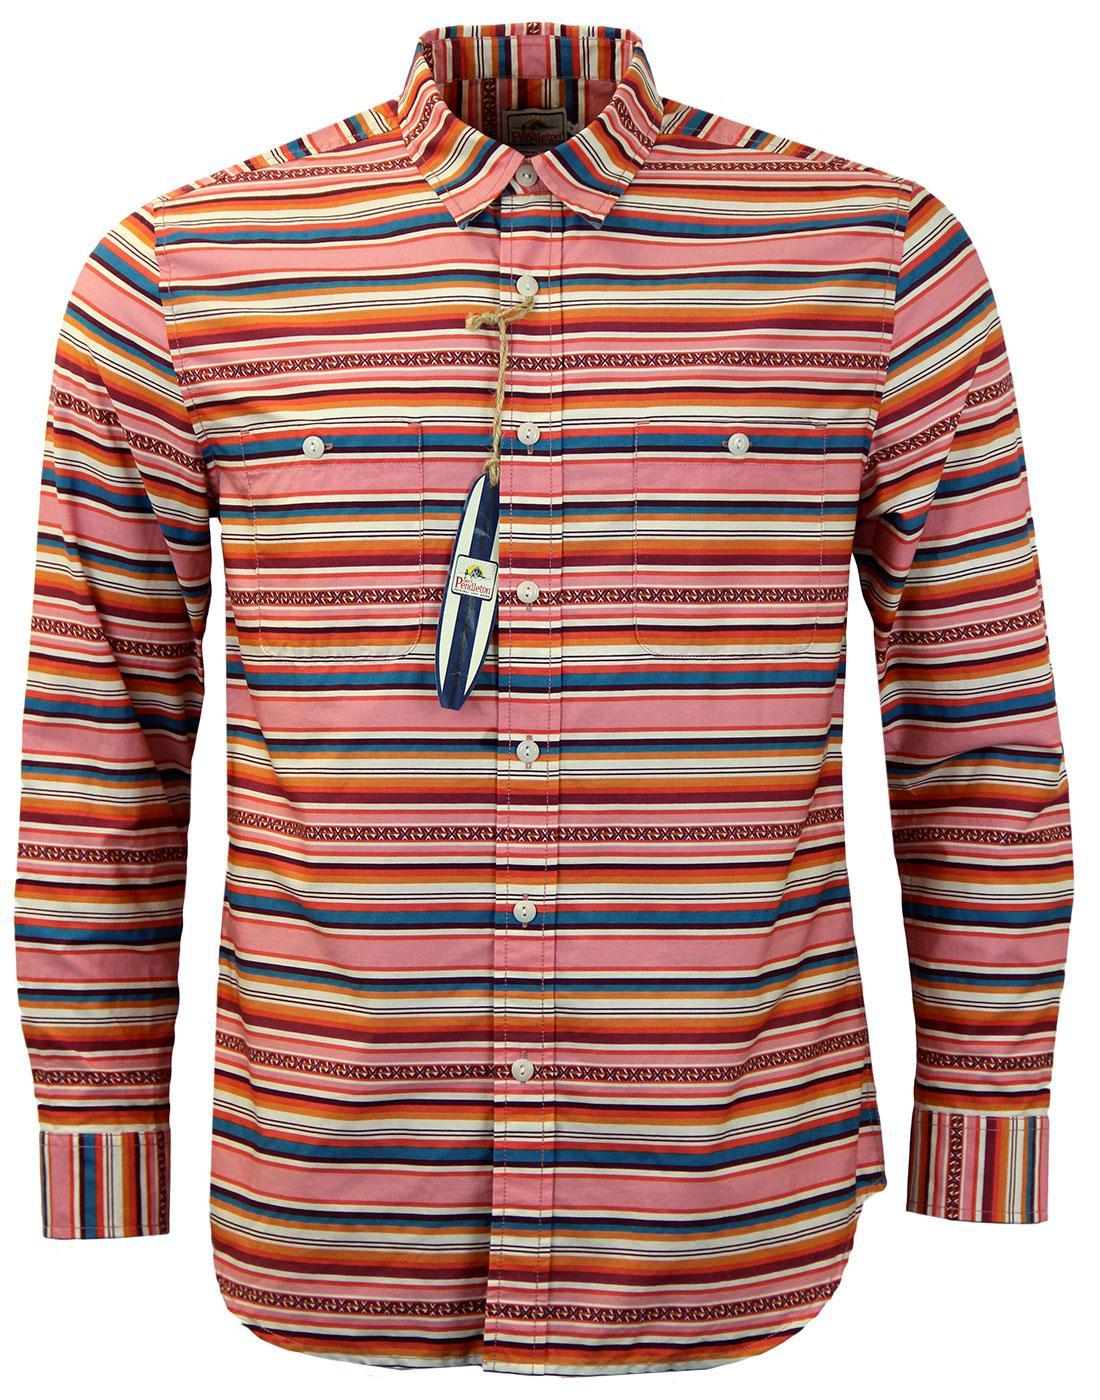 PENDLETON Serape Surf Stripe Retro 60s Board Shirt